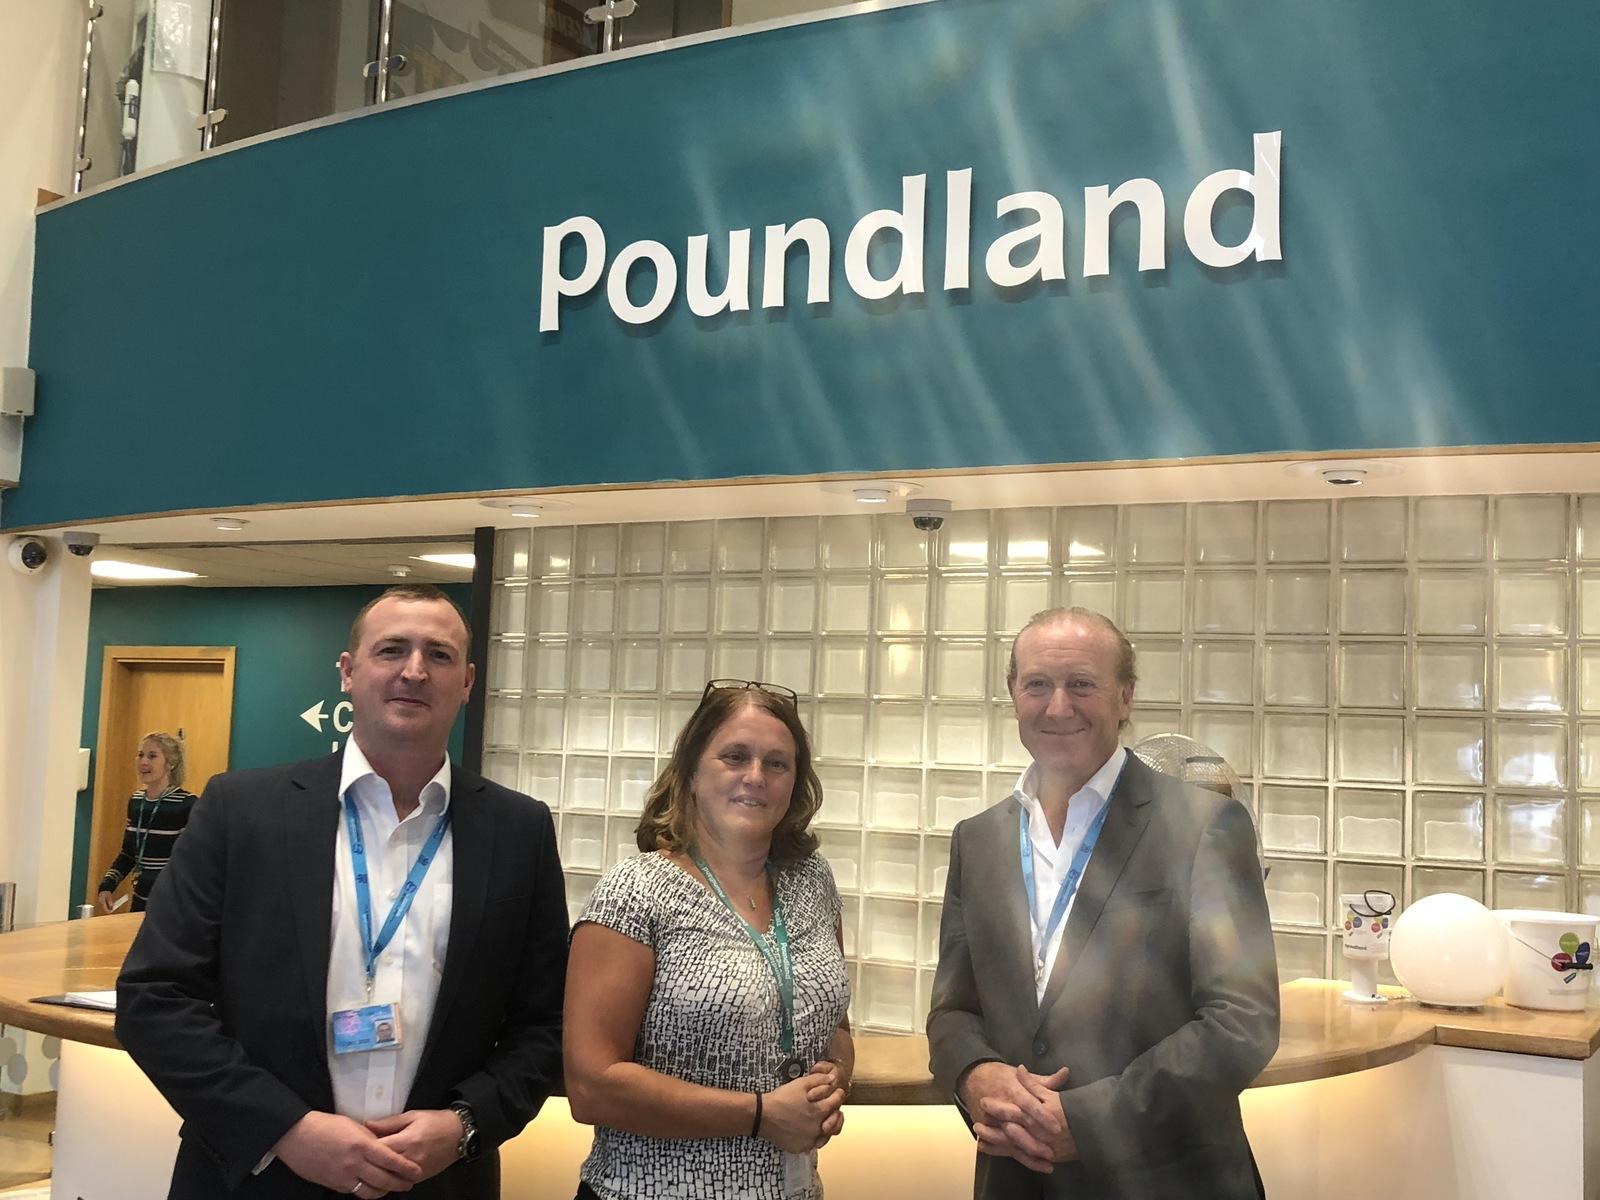 POUNDLAND AWARDS NATIONAL GUARDING CONTRACT TO LODGE SECURITY